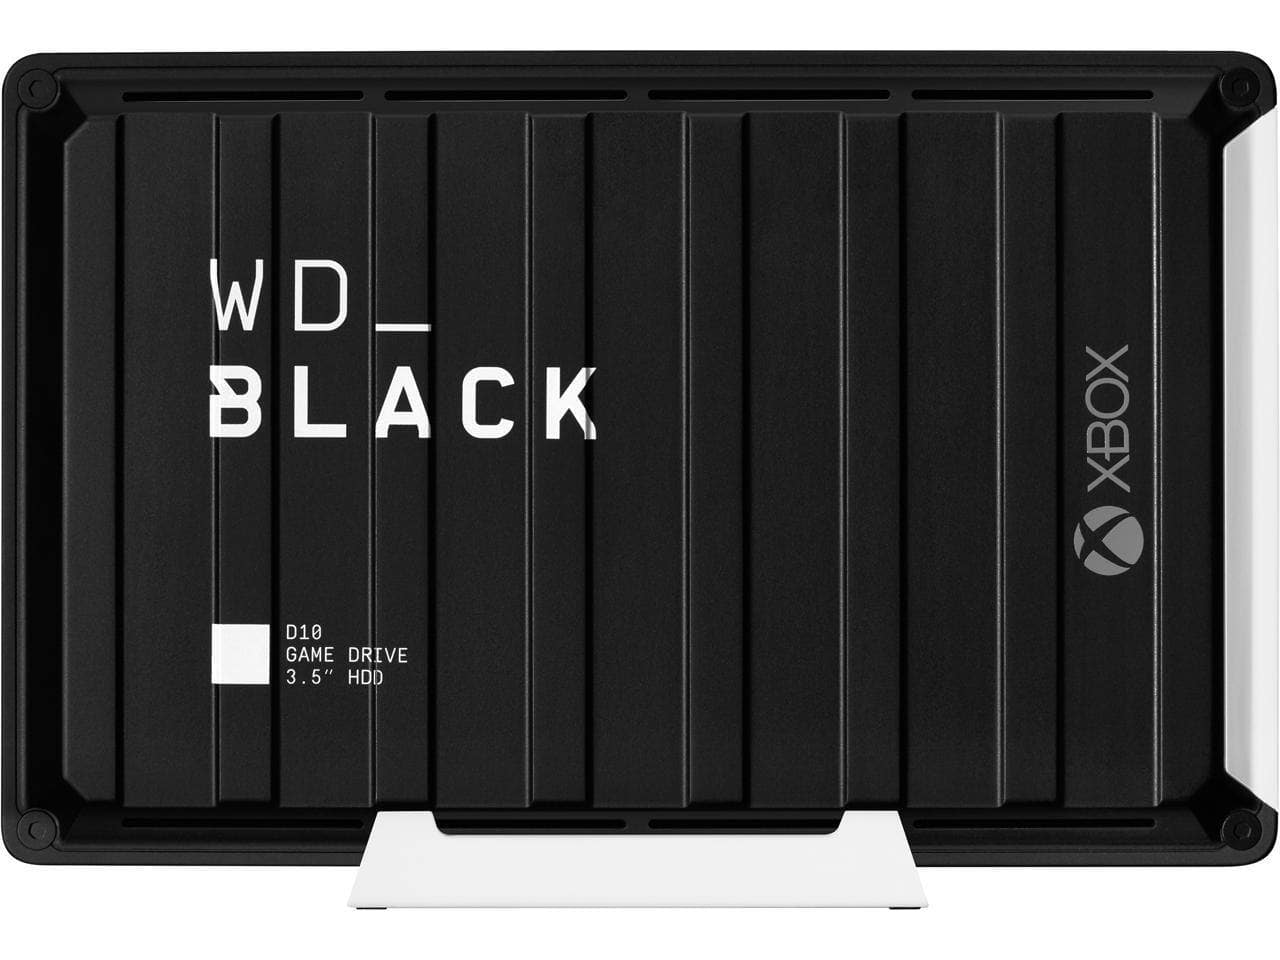 WD Black 12TB D10 Portable External Hard Drive $219.99 AC Shipped